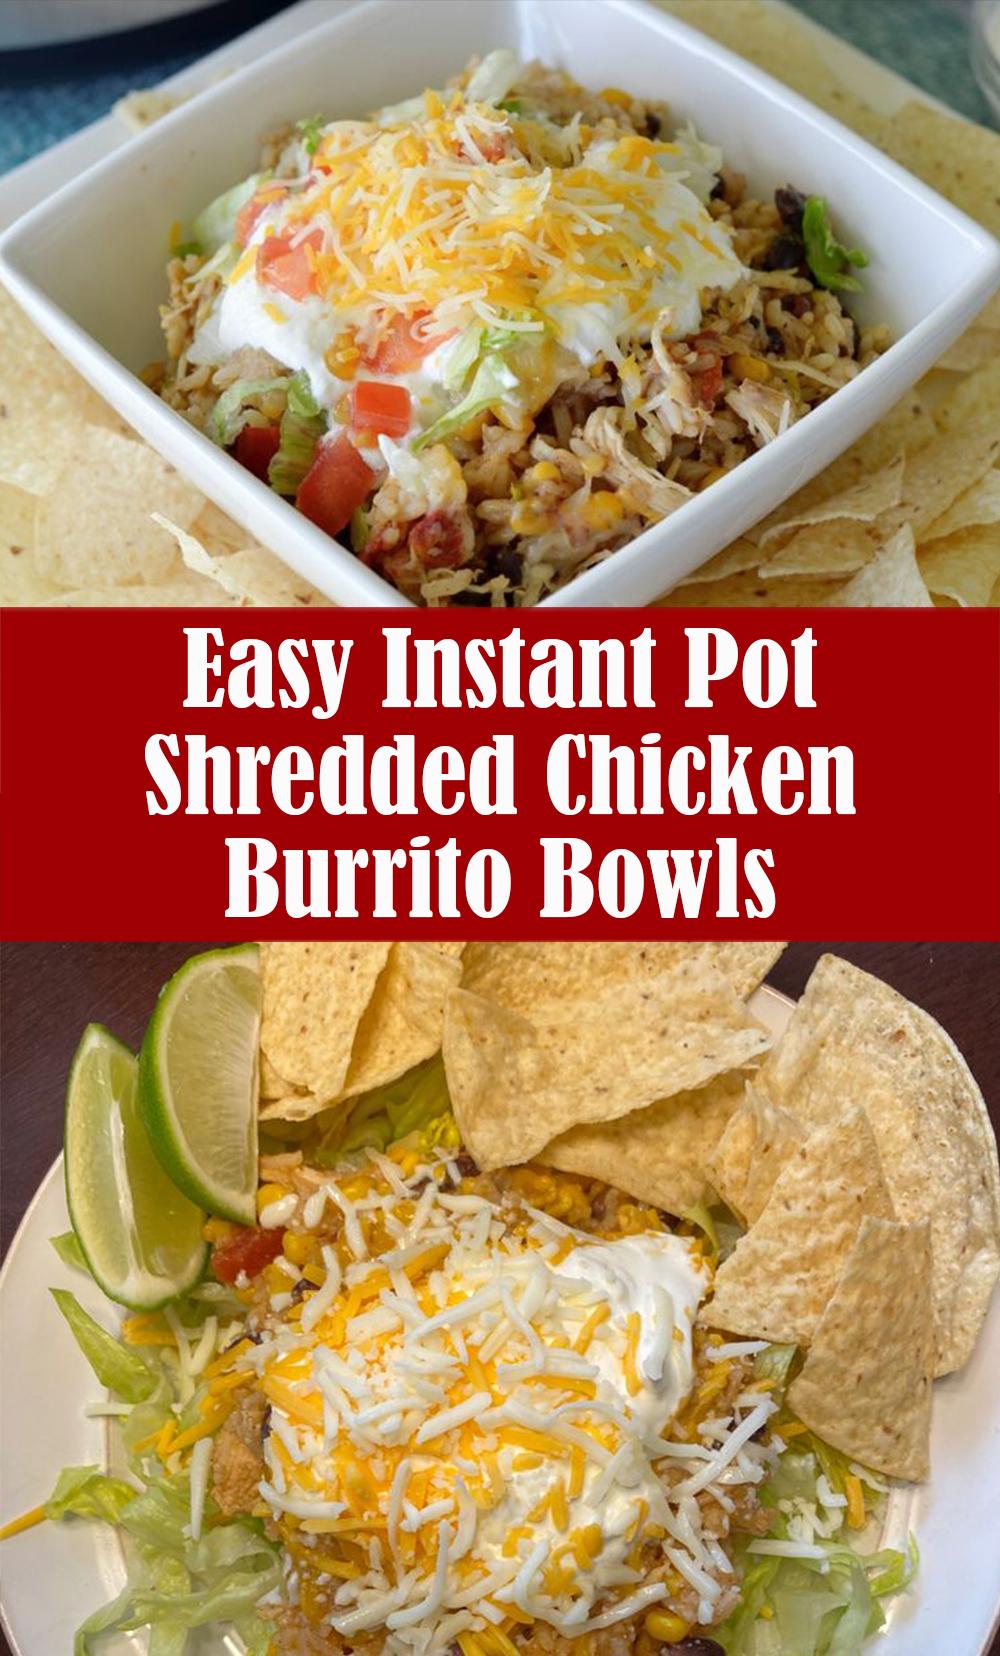 Easy Instant Pot Shredded Chicken Burrito Bowls